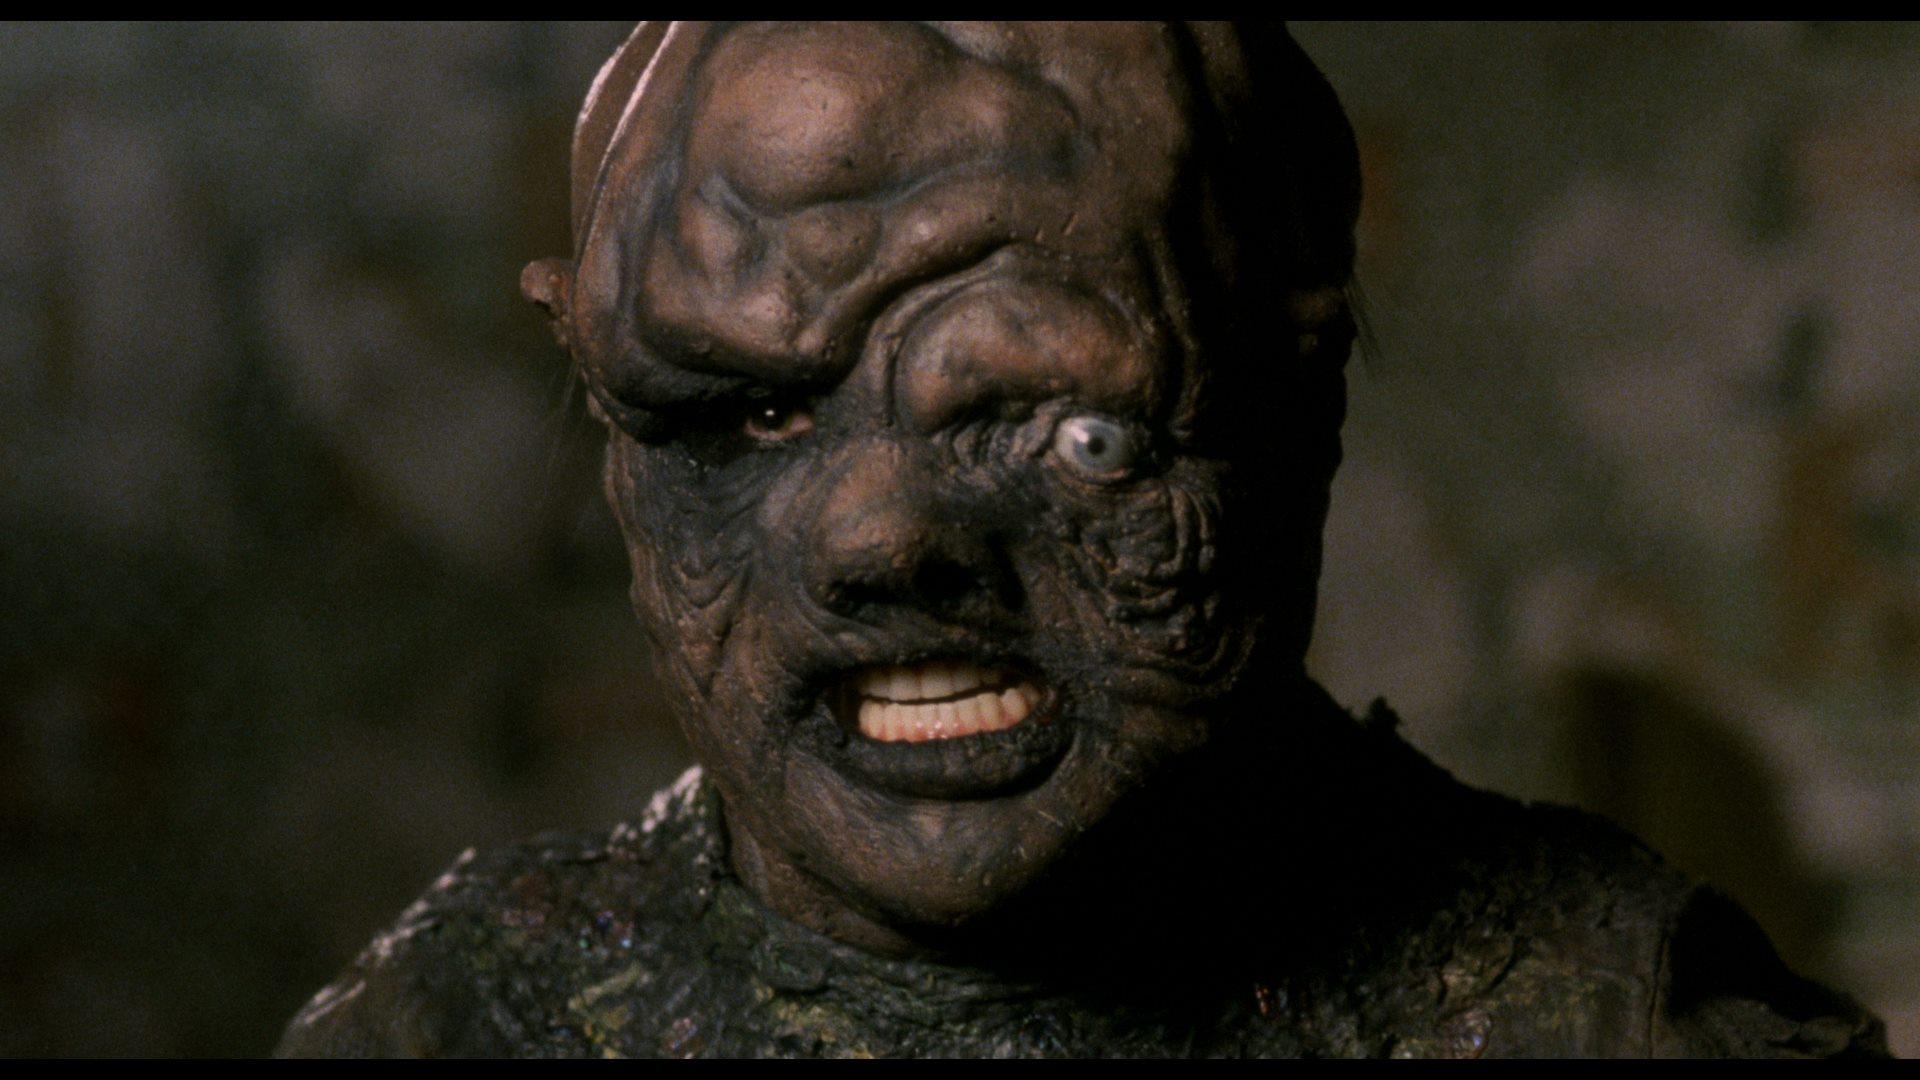 The Toxic Avenger: Macon Blair scriverà e dirigerà il reboot della saga